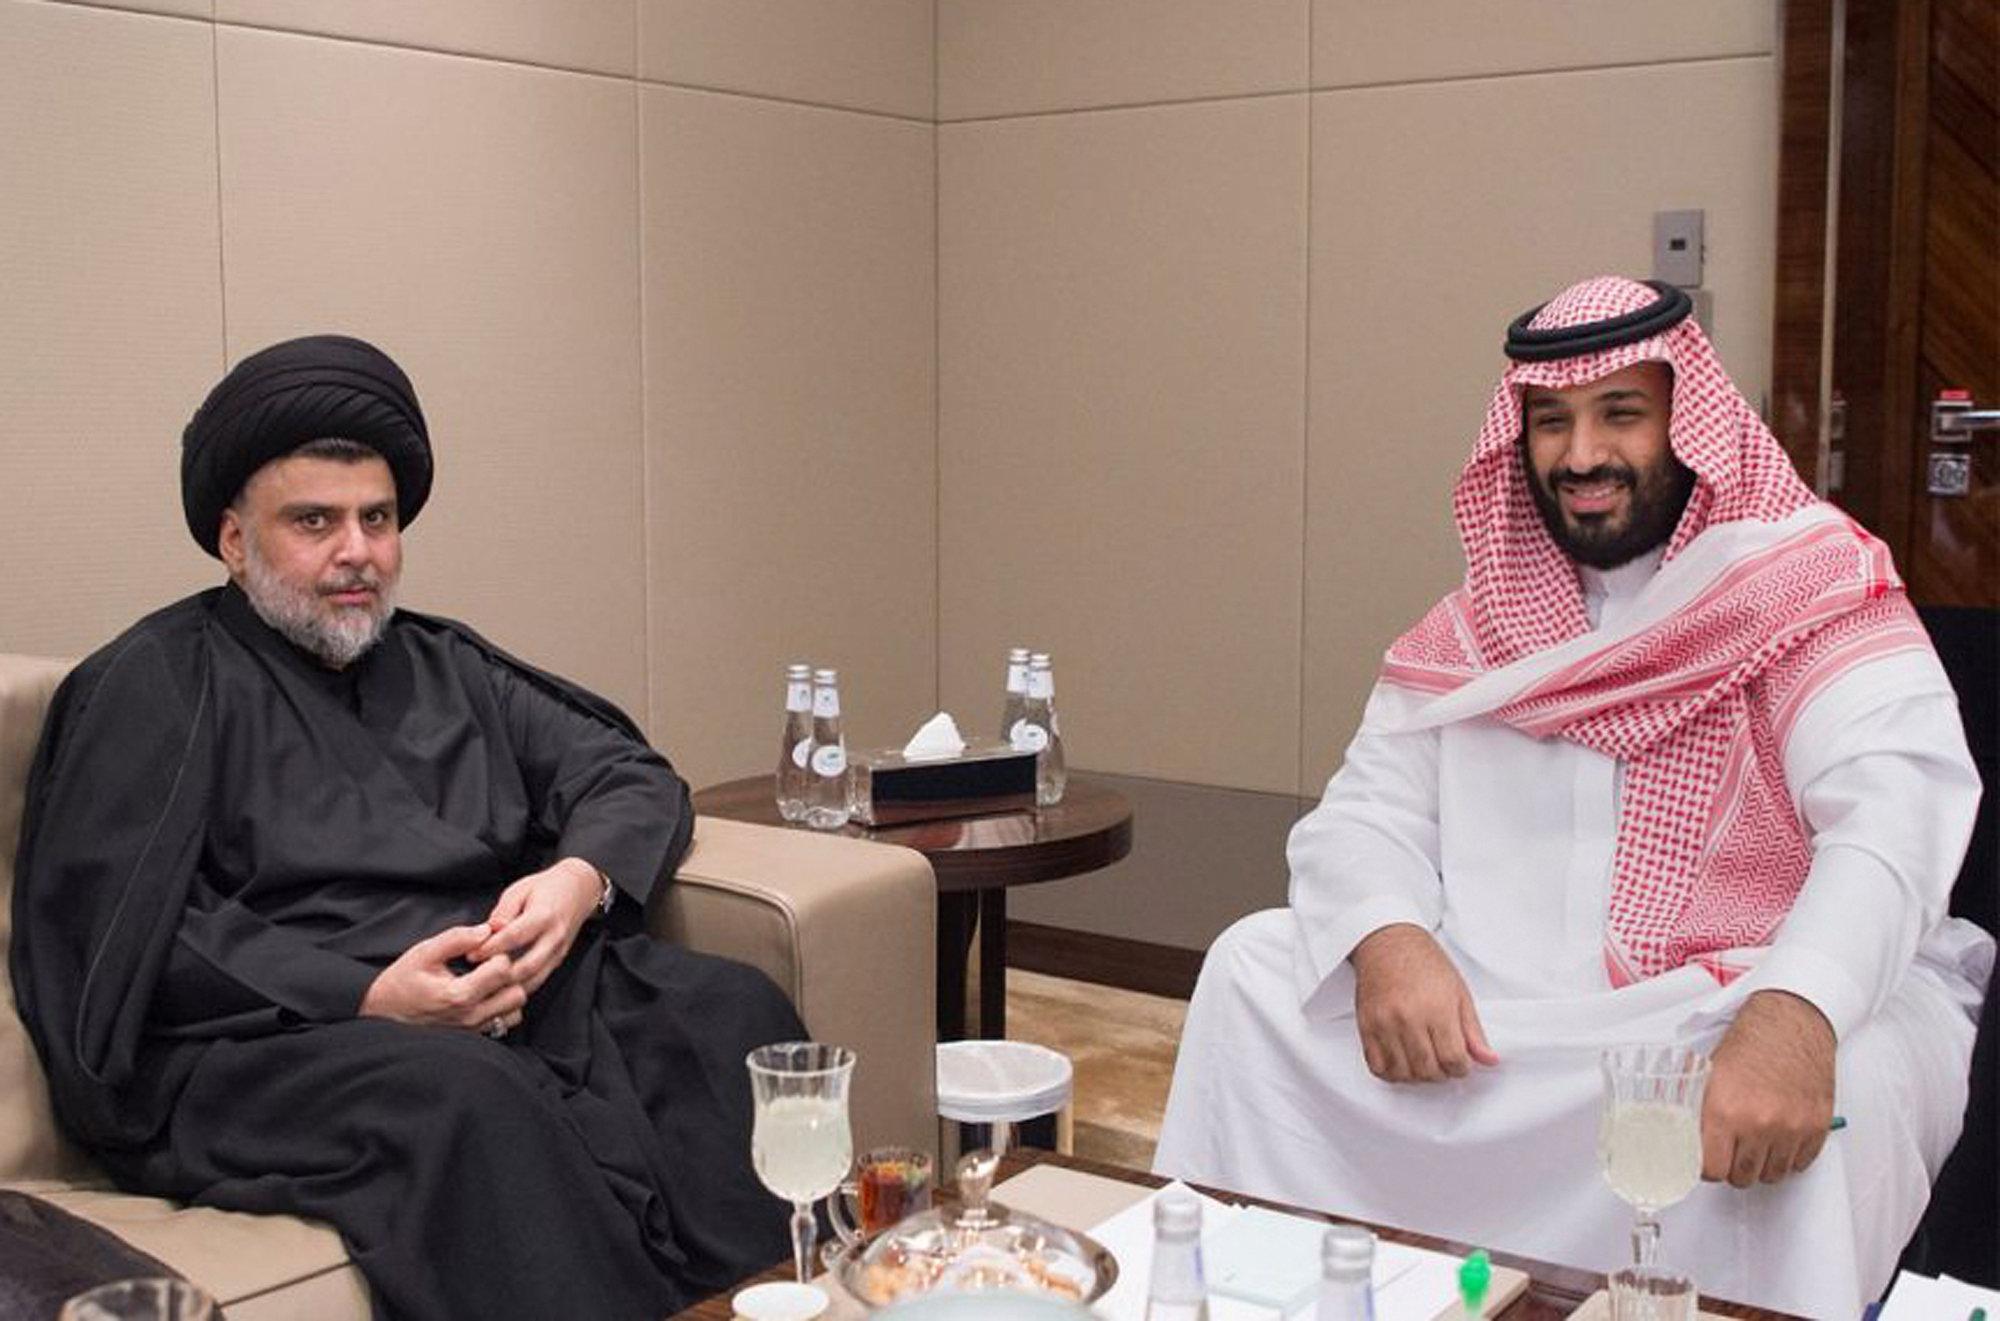 Muqtada al-Sadr and Mohammed bin Salman